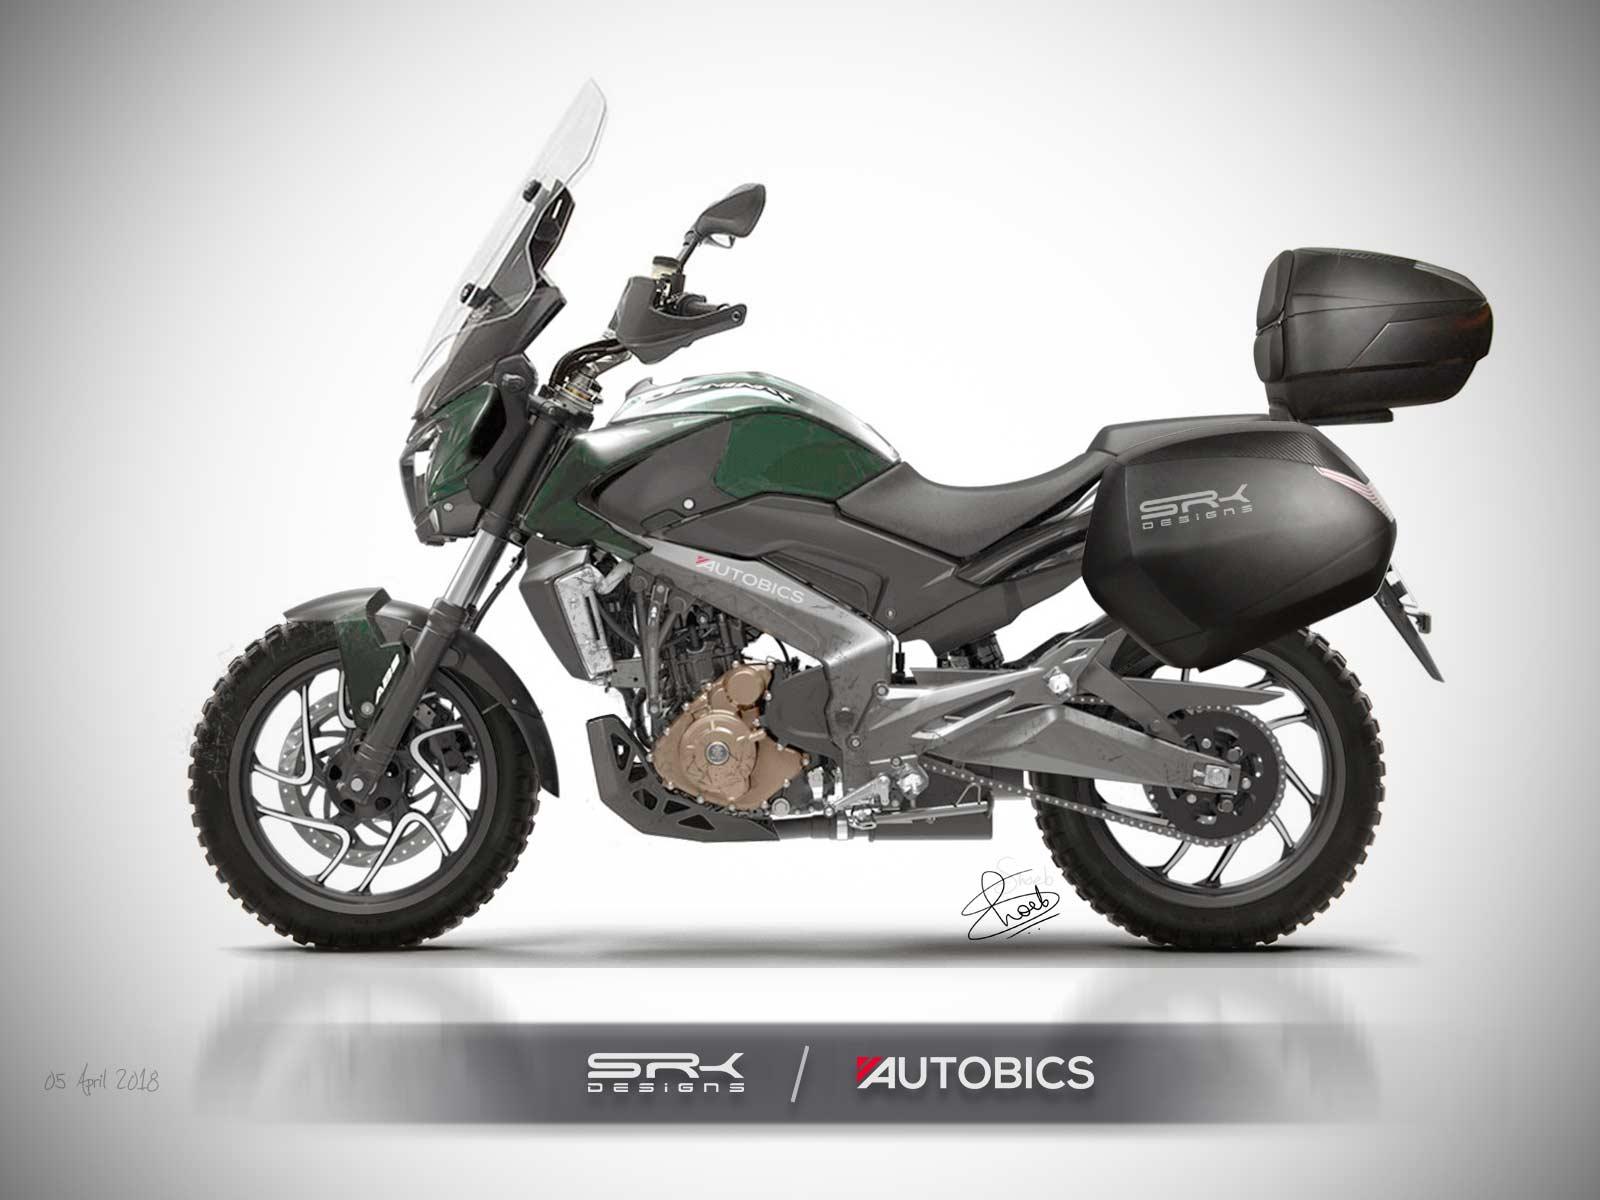 Bajaj Dominar 400 Adventure Edition Imagined Rendering